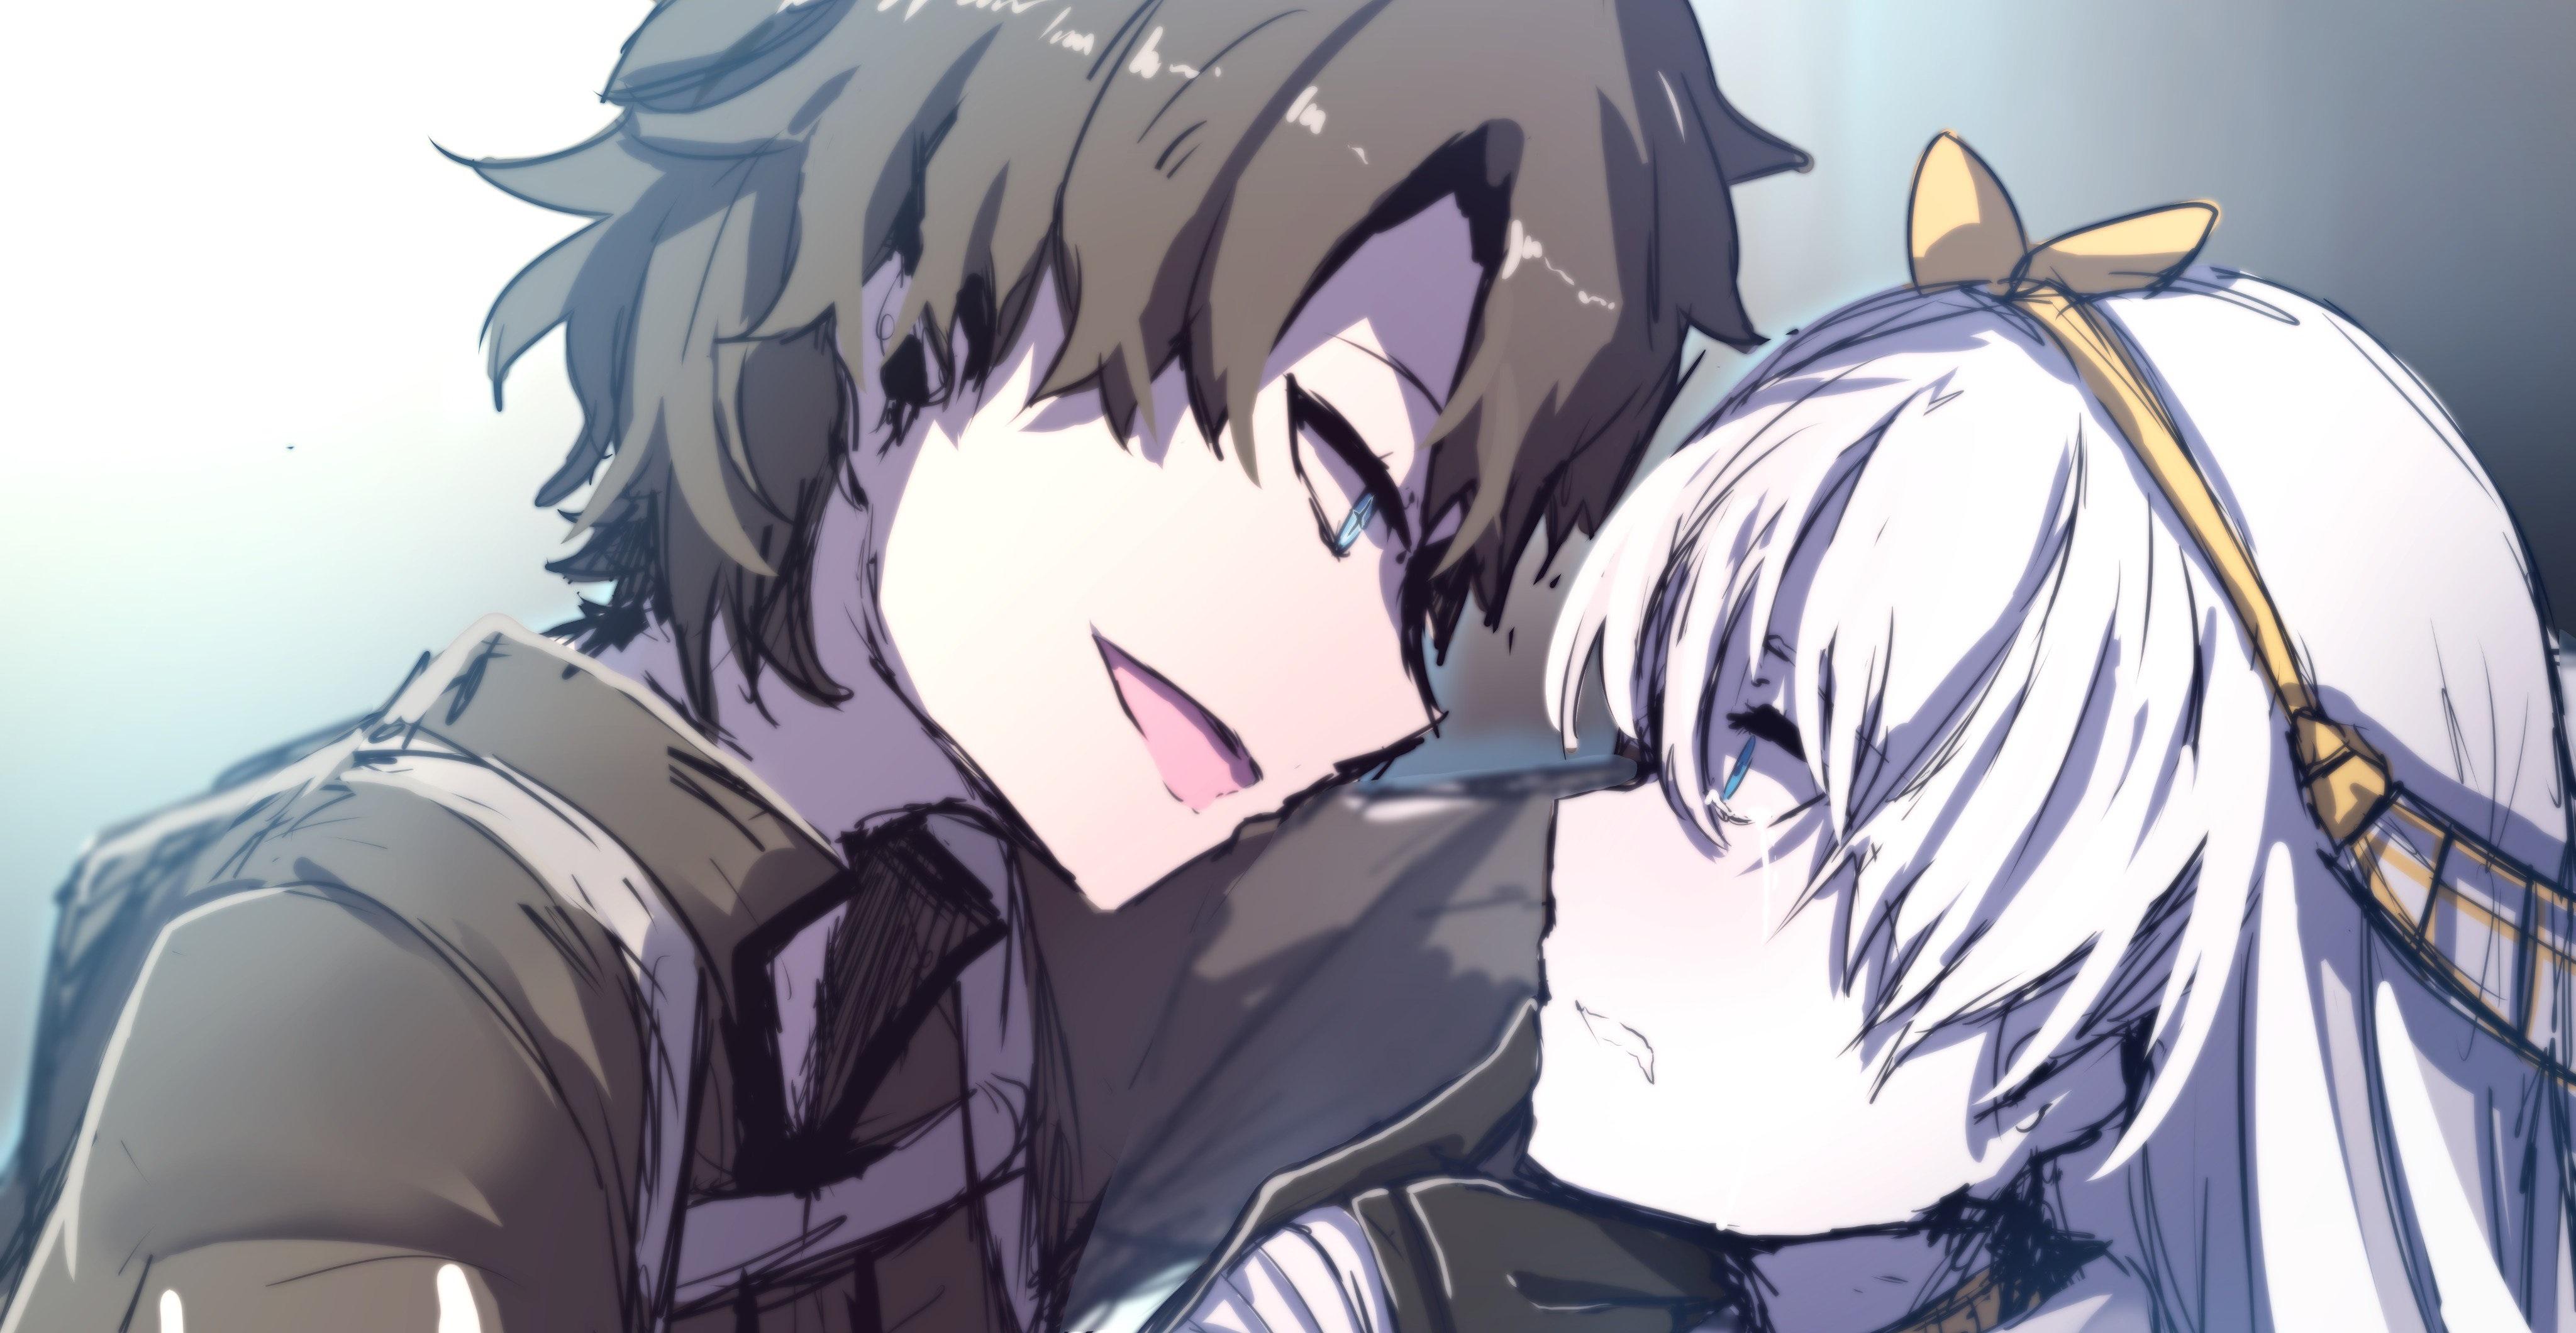 Fate Grand Order Hd Wallpaper Background Image 4096x2120 Id 921447 Wallpaper Abyss Anime movies anime drawings kotori itsuka tohka yatogami anime wallpaper anime date. 4096x2120 id 921447 wallpaper abyss